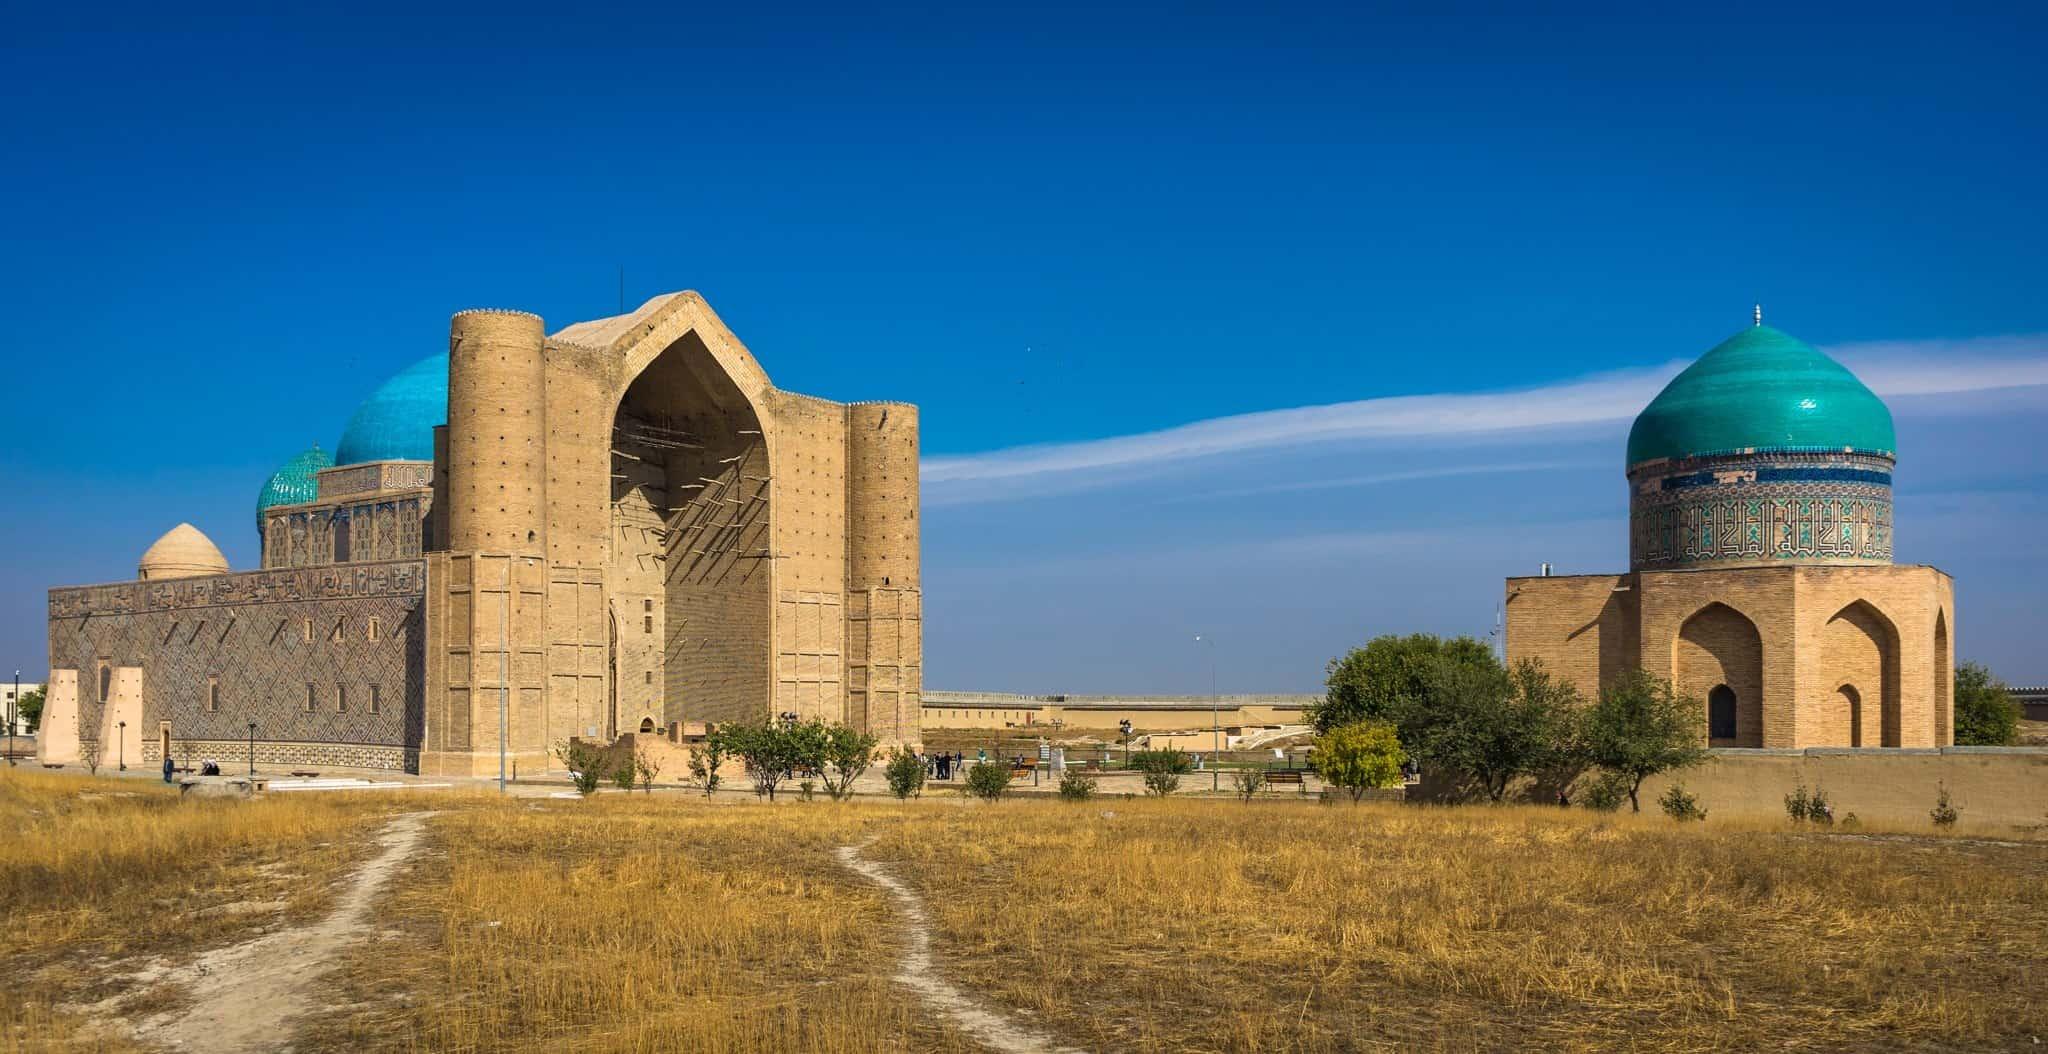 Turkistan the Mausoleum of Khawaja Ahmed Yasawi